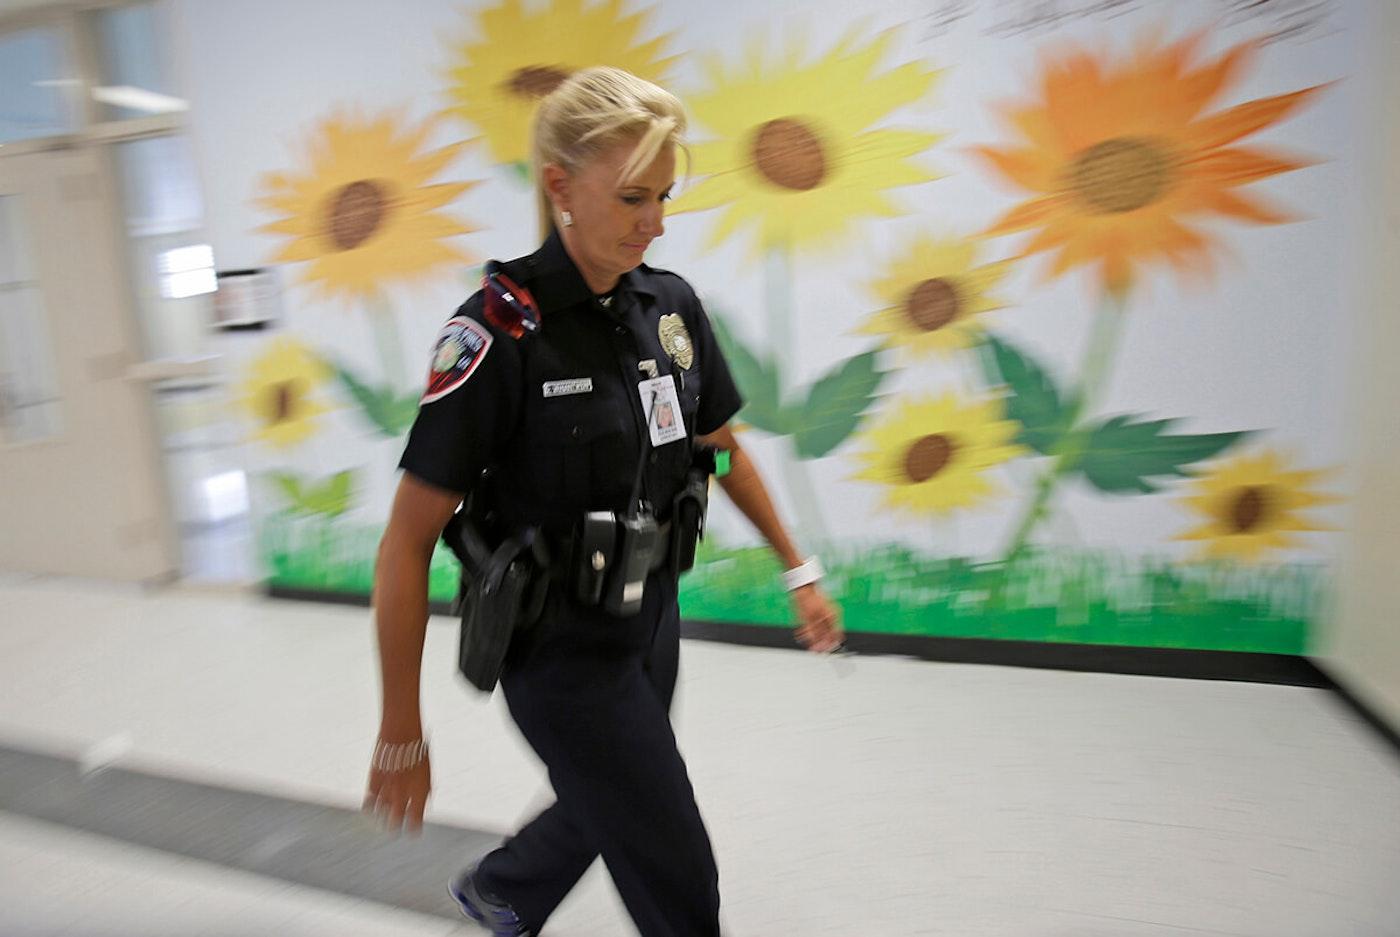 school resource officer walking down school hallway